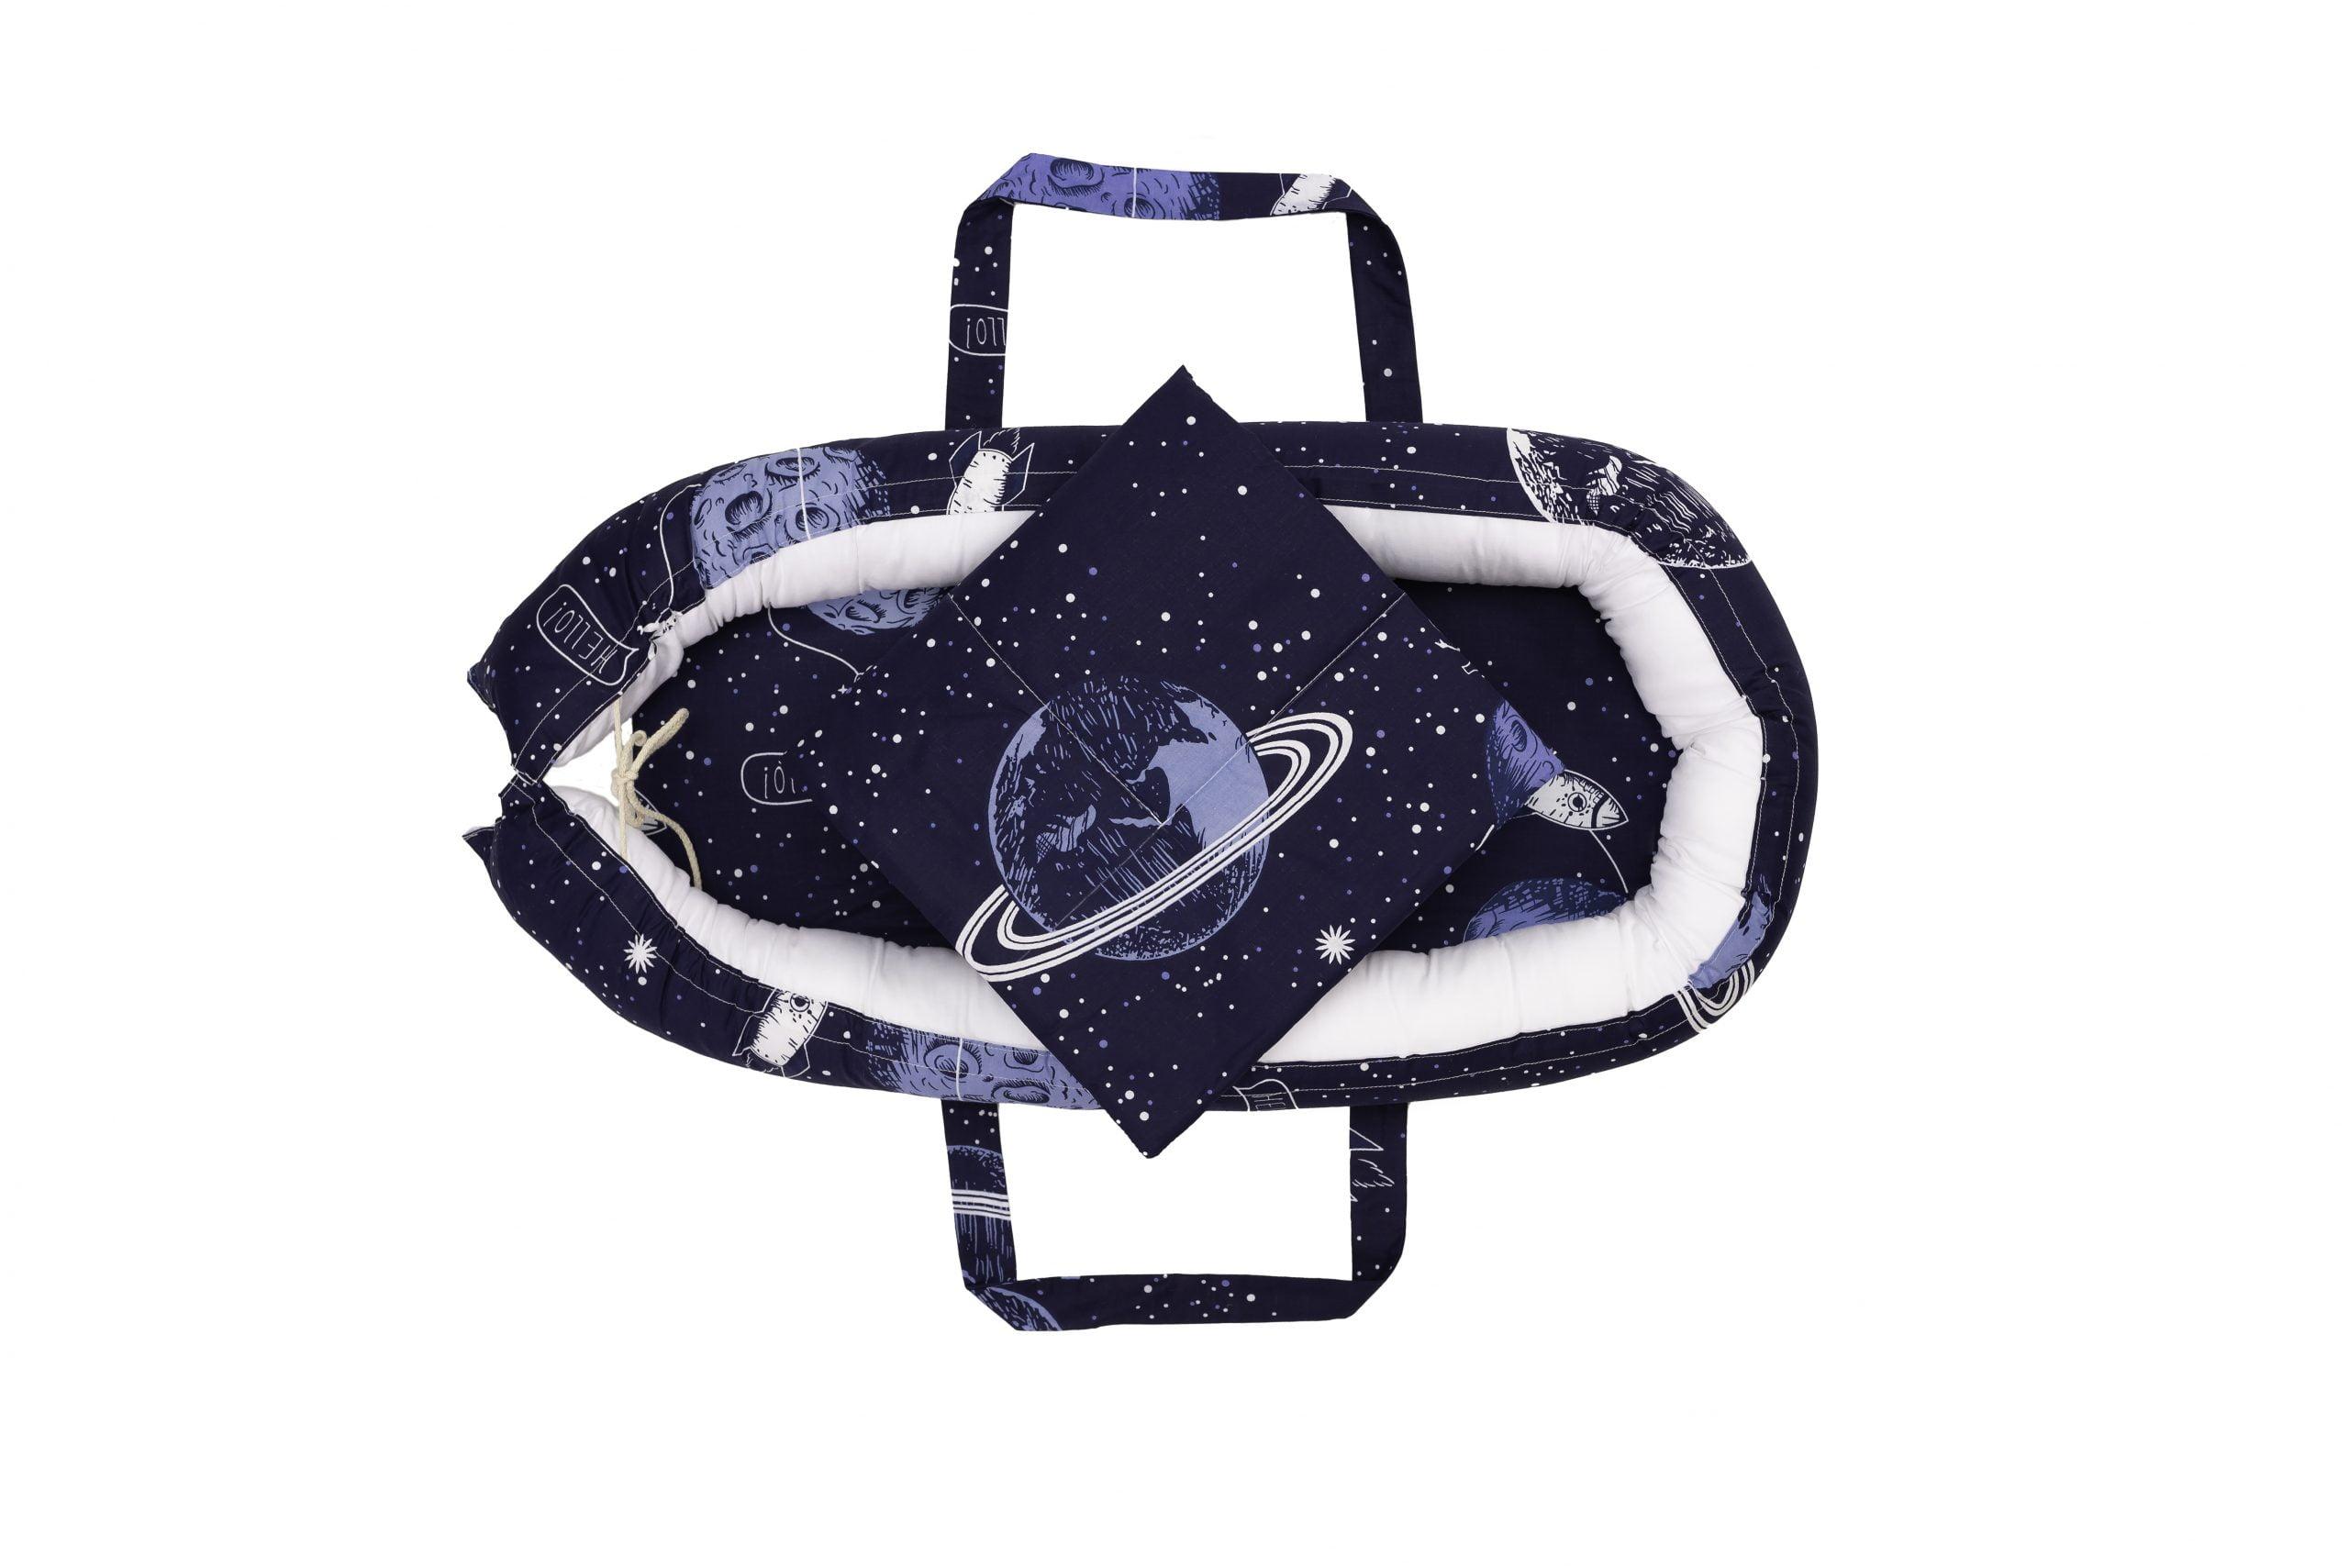 Baby Nest Somnart: Cosulet bebelusi + Salteluta 42x84x2 cm + Paturica 70x70 cm model Cosmos imagine 2021 somnart.ro